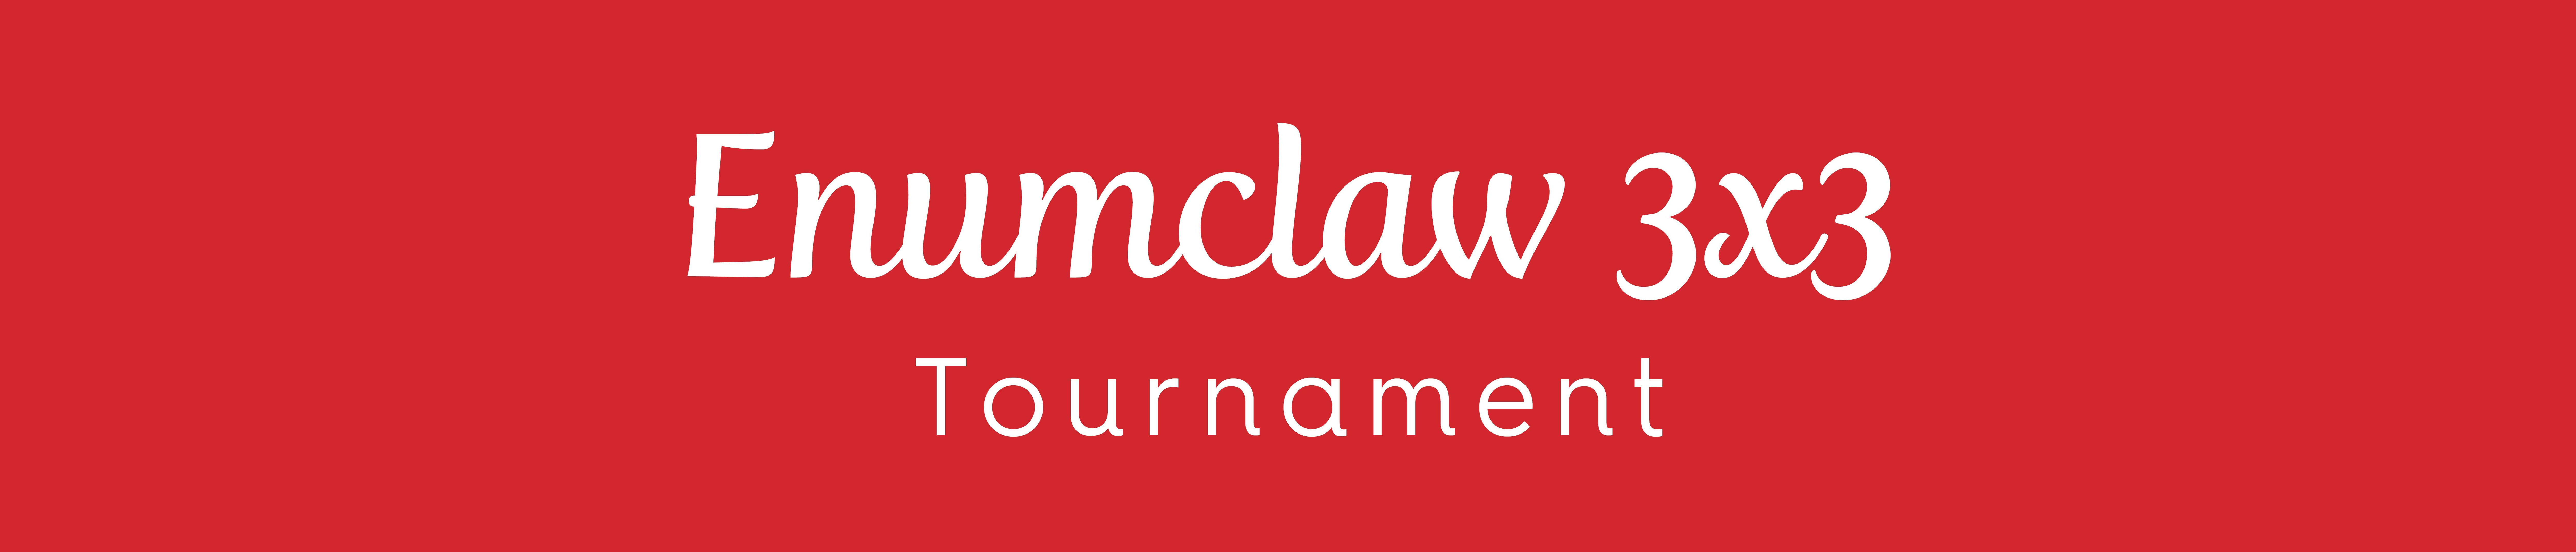 3x3 tournament.jpg